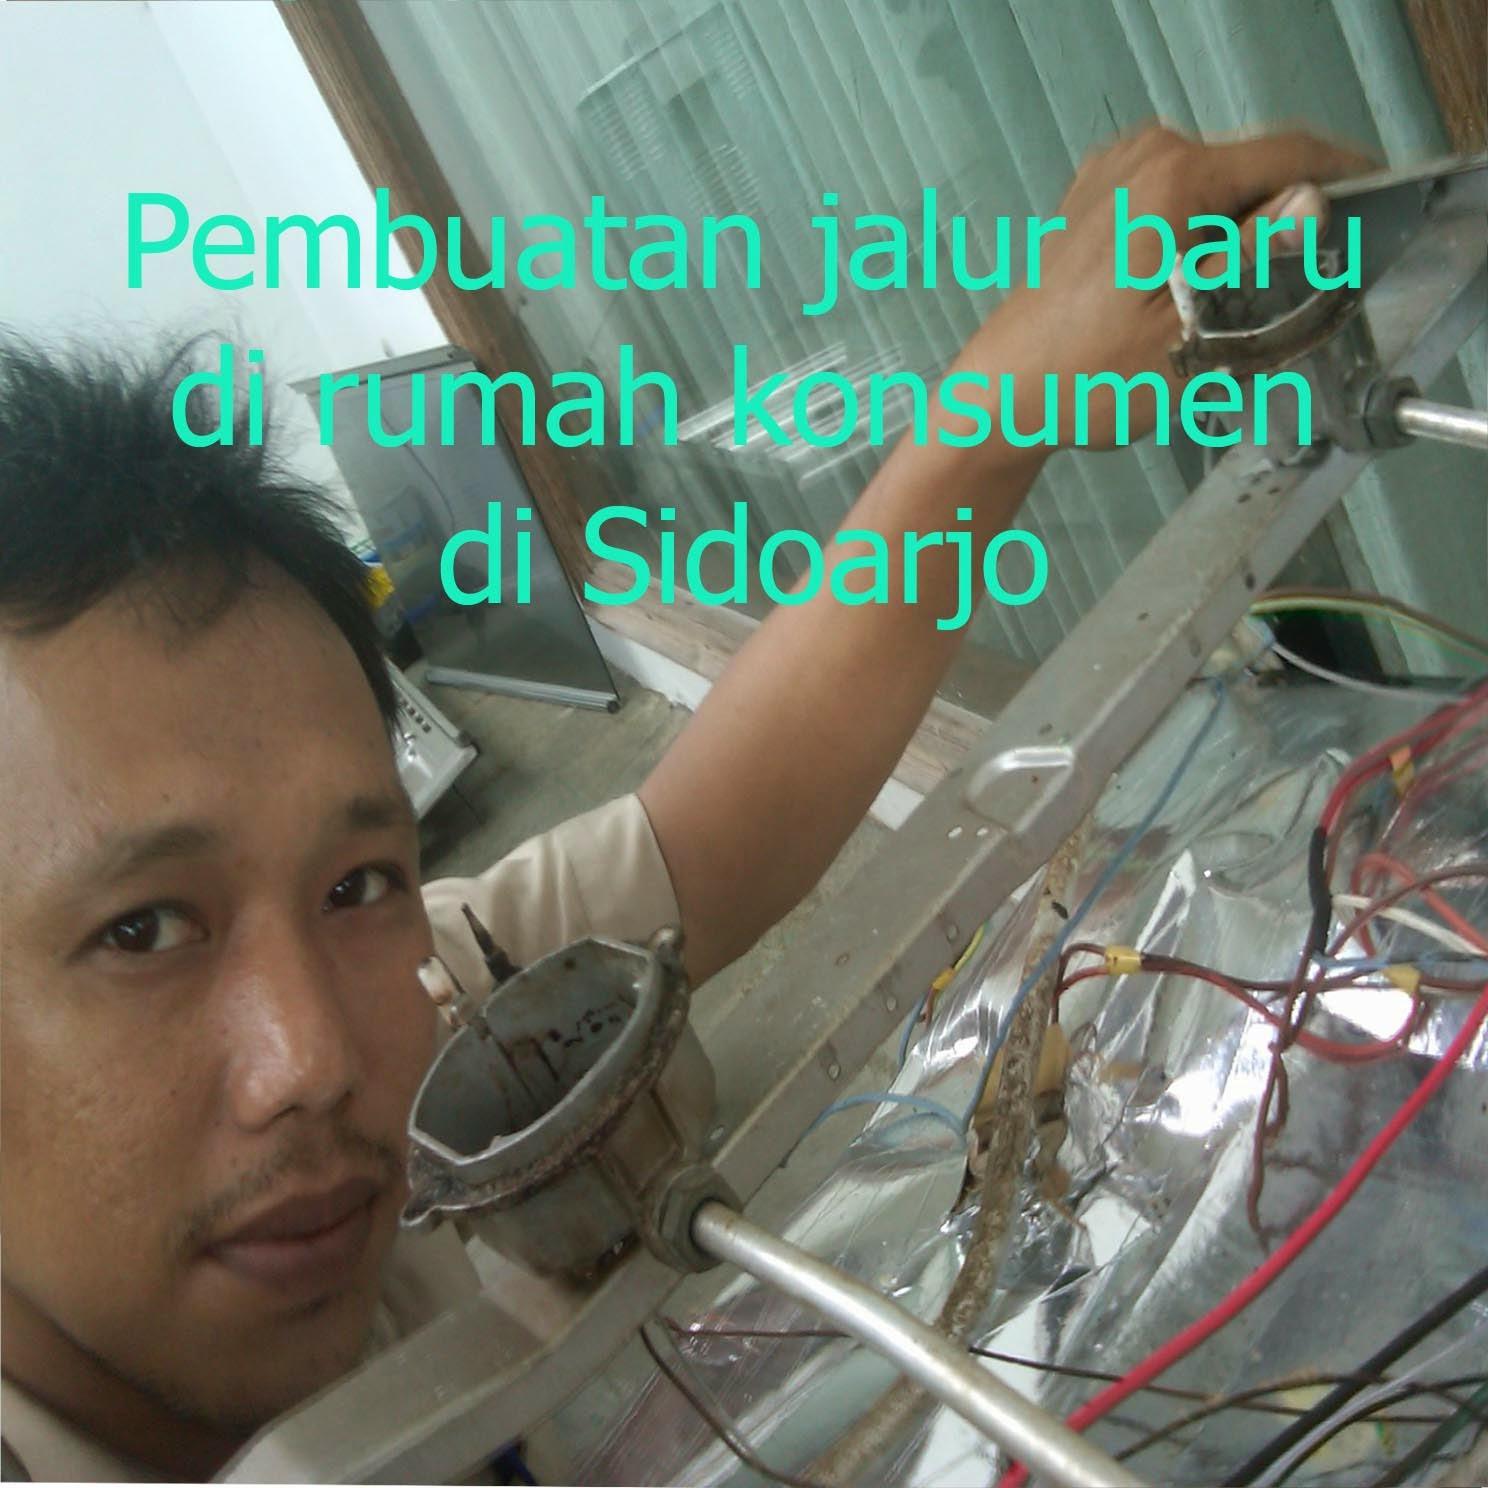 http://kdidik.blogspot.com/